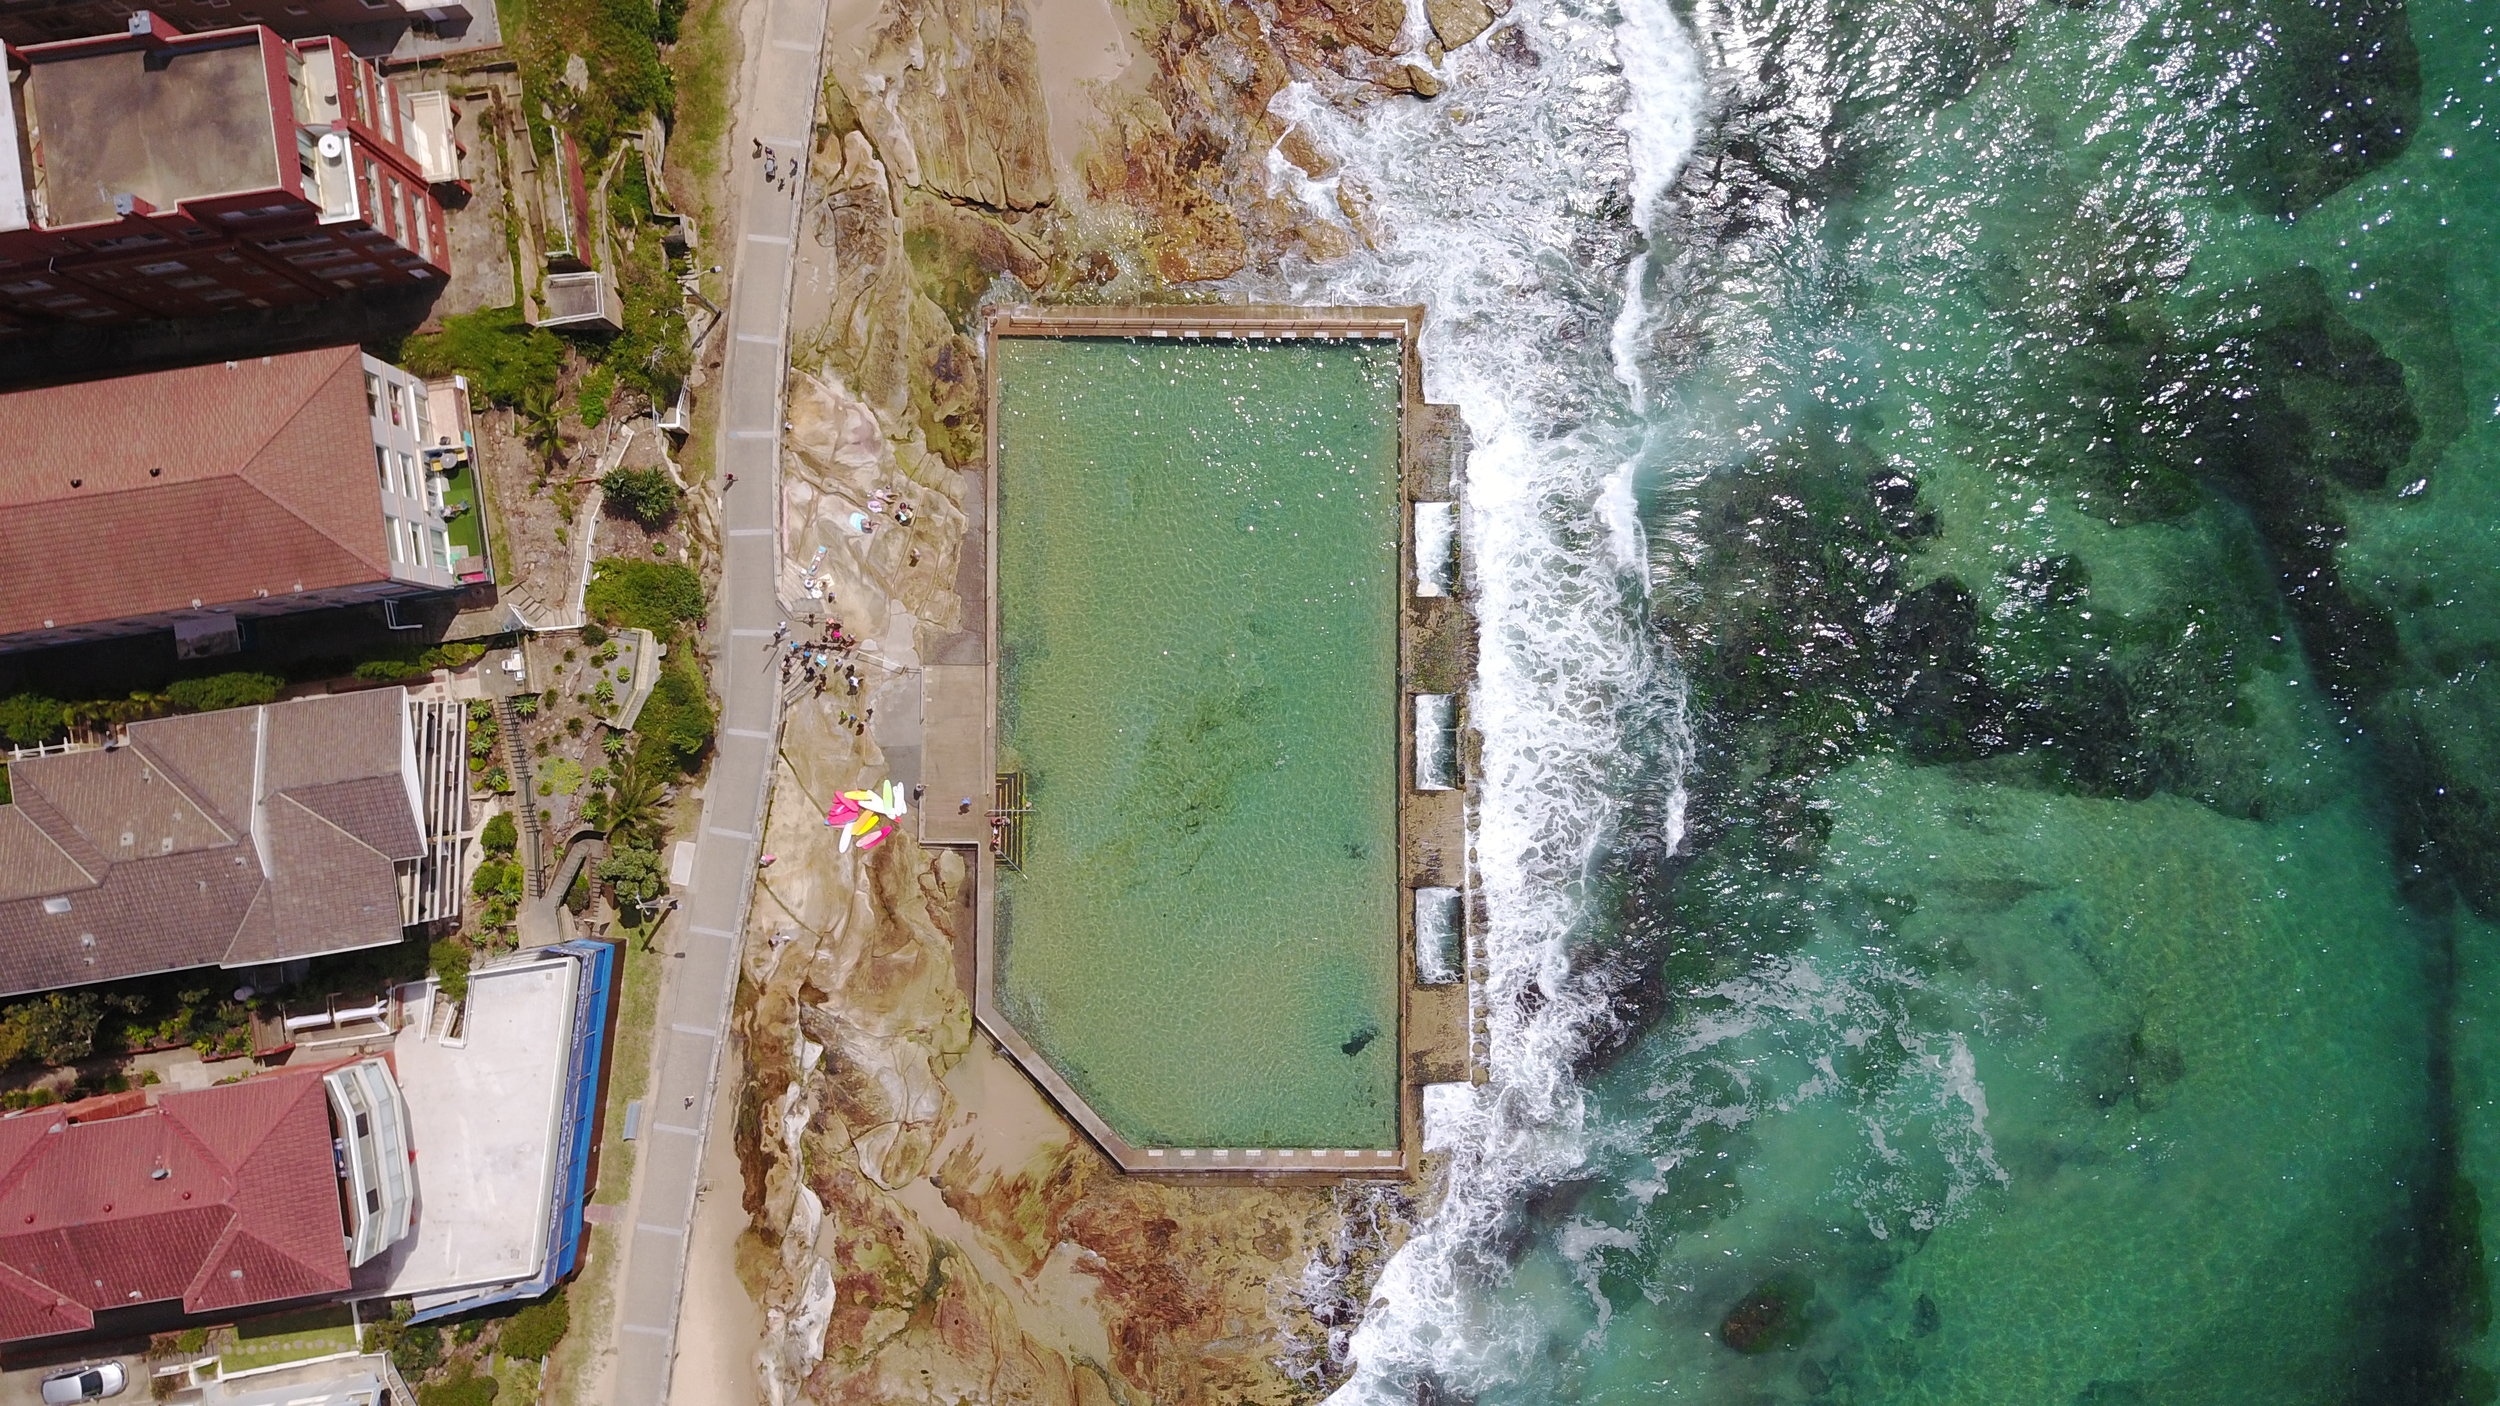 south cronulla - south cronulla ocean pool, nsw